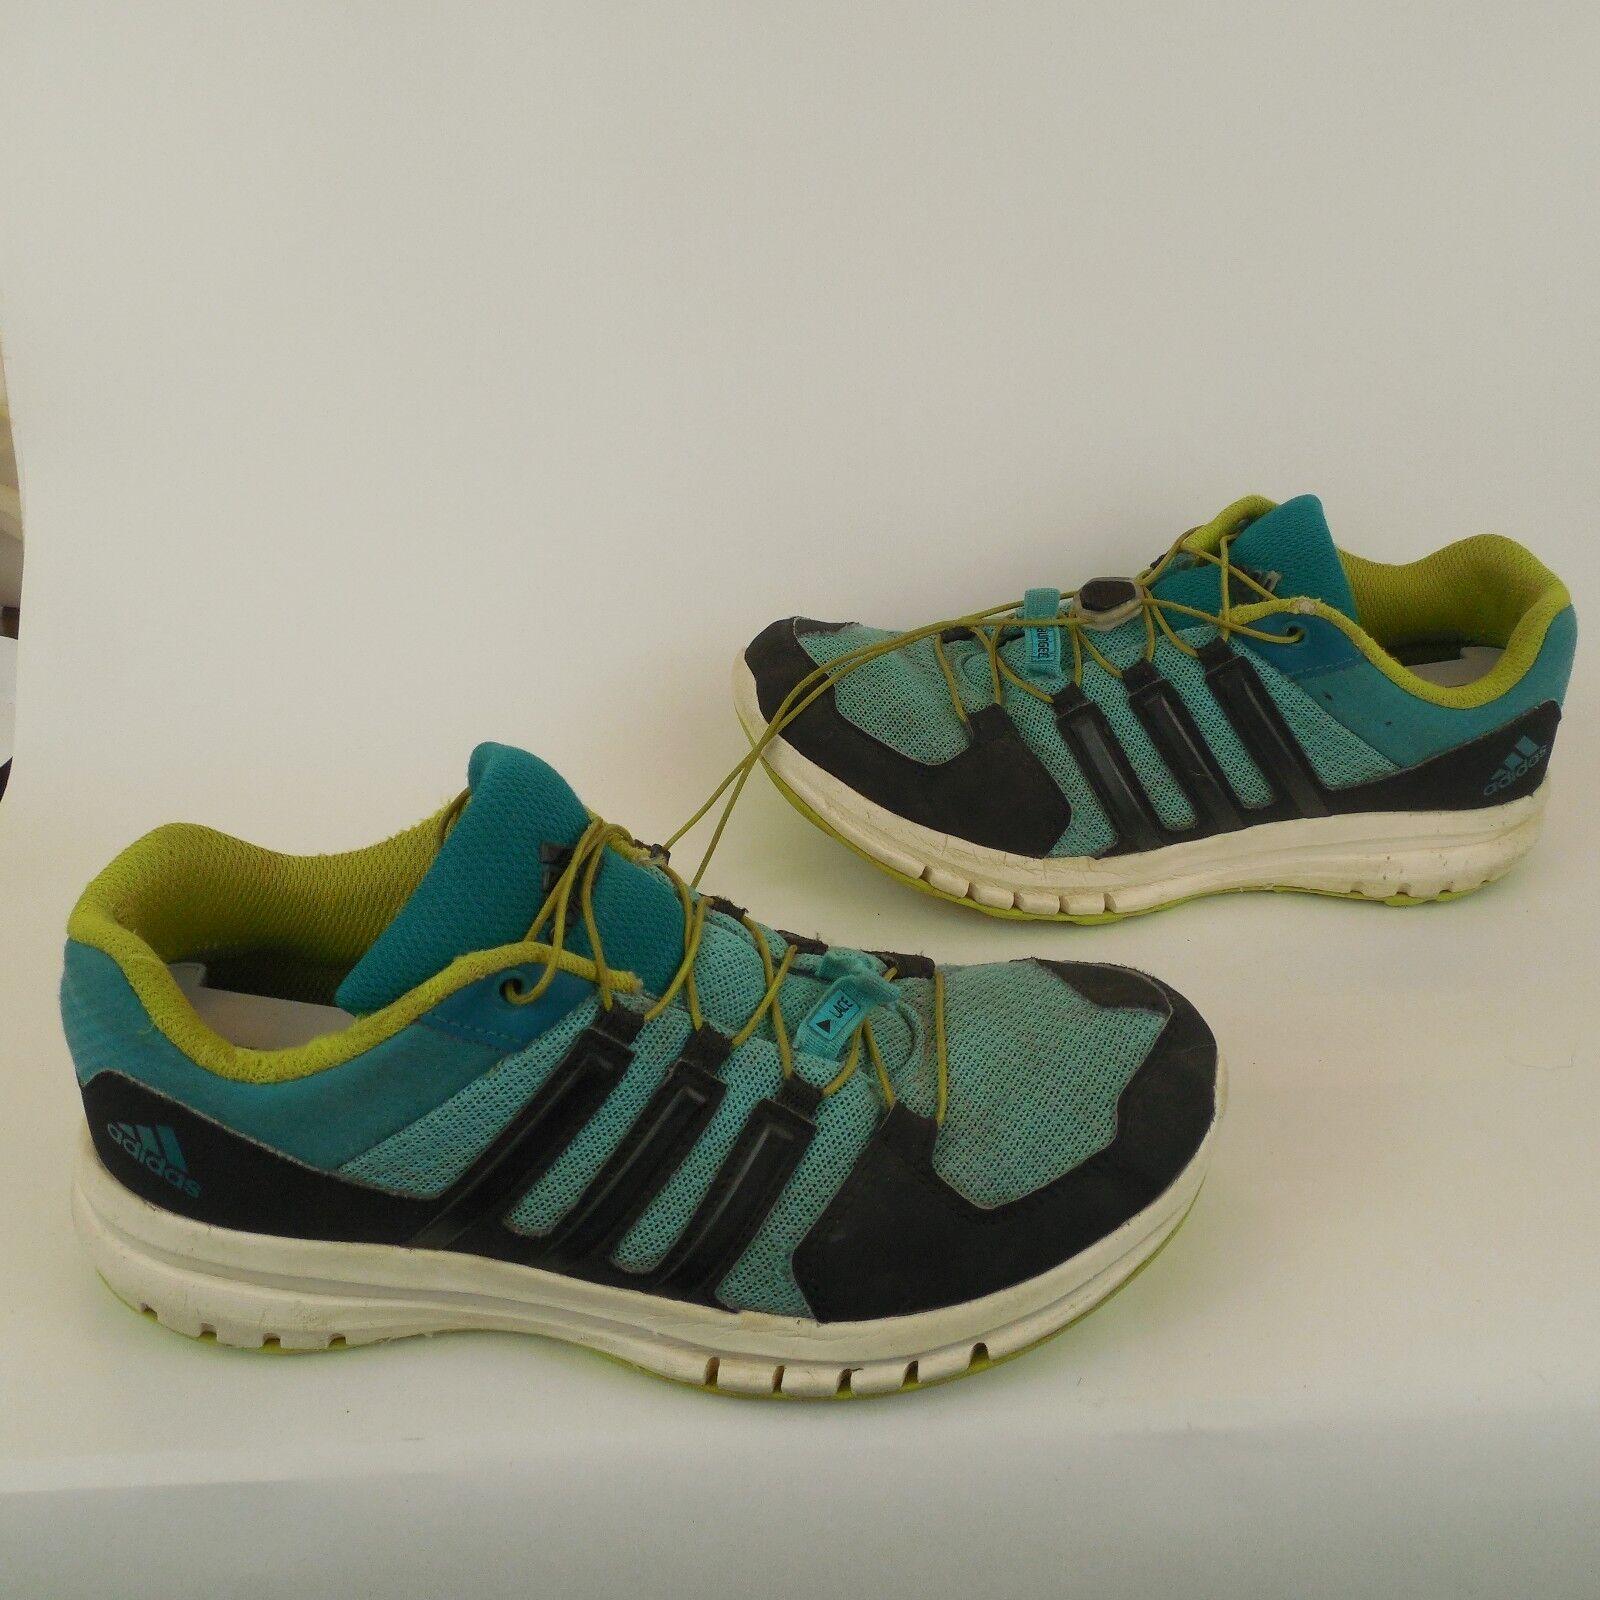 where can i buy the best reliable quality adidas s yya606001 bleu marine Vert Vert marine chaussures ...